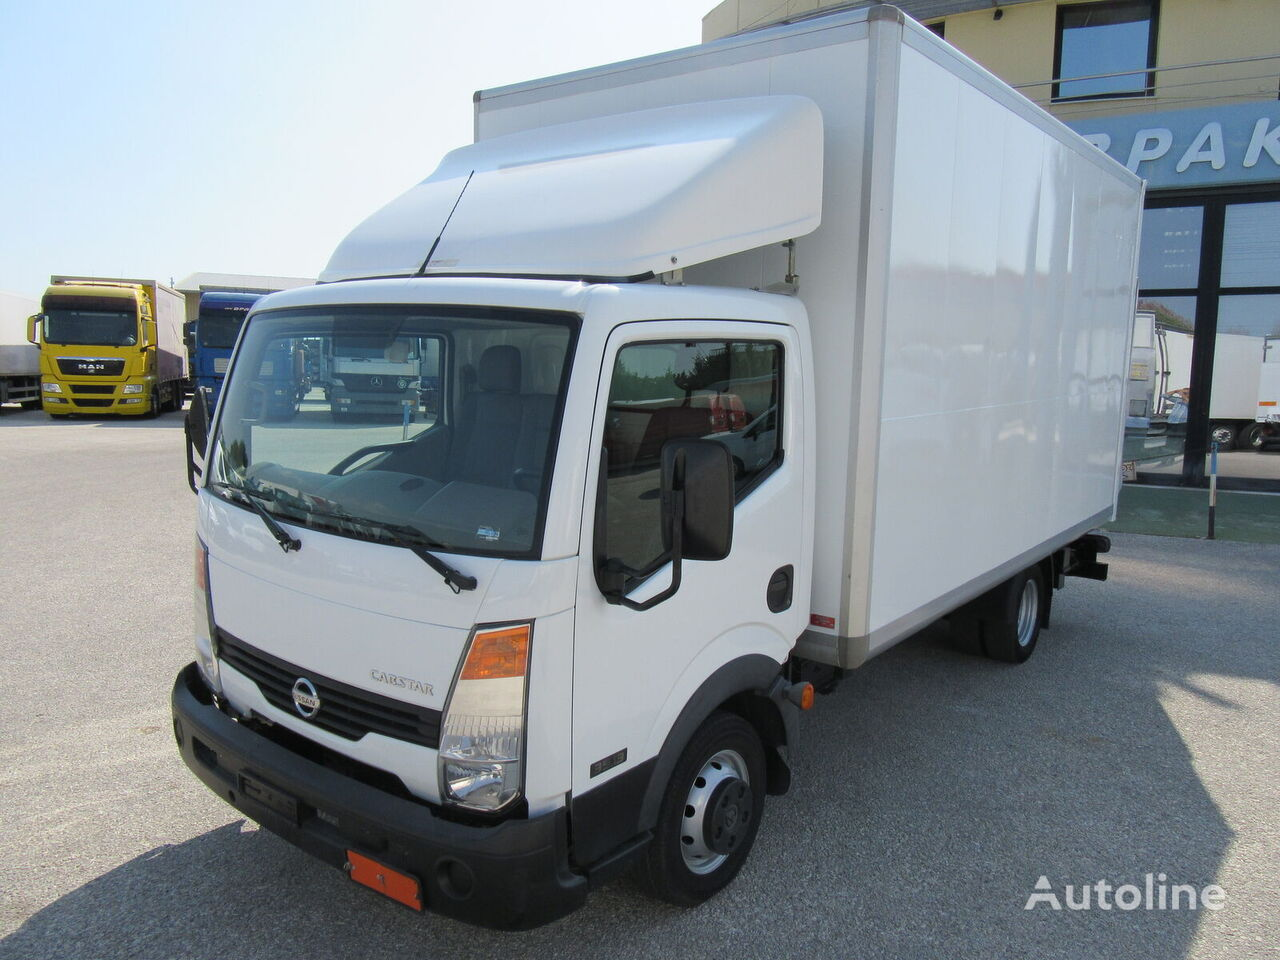 sunkvežimis furgonas NISSAN CABSTAR F24